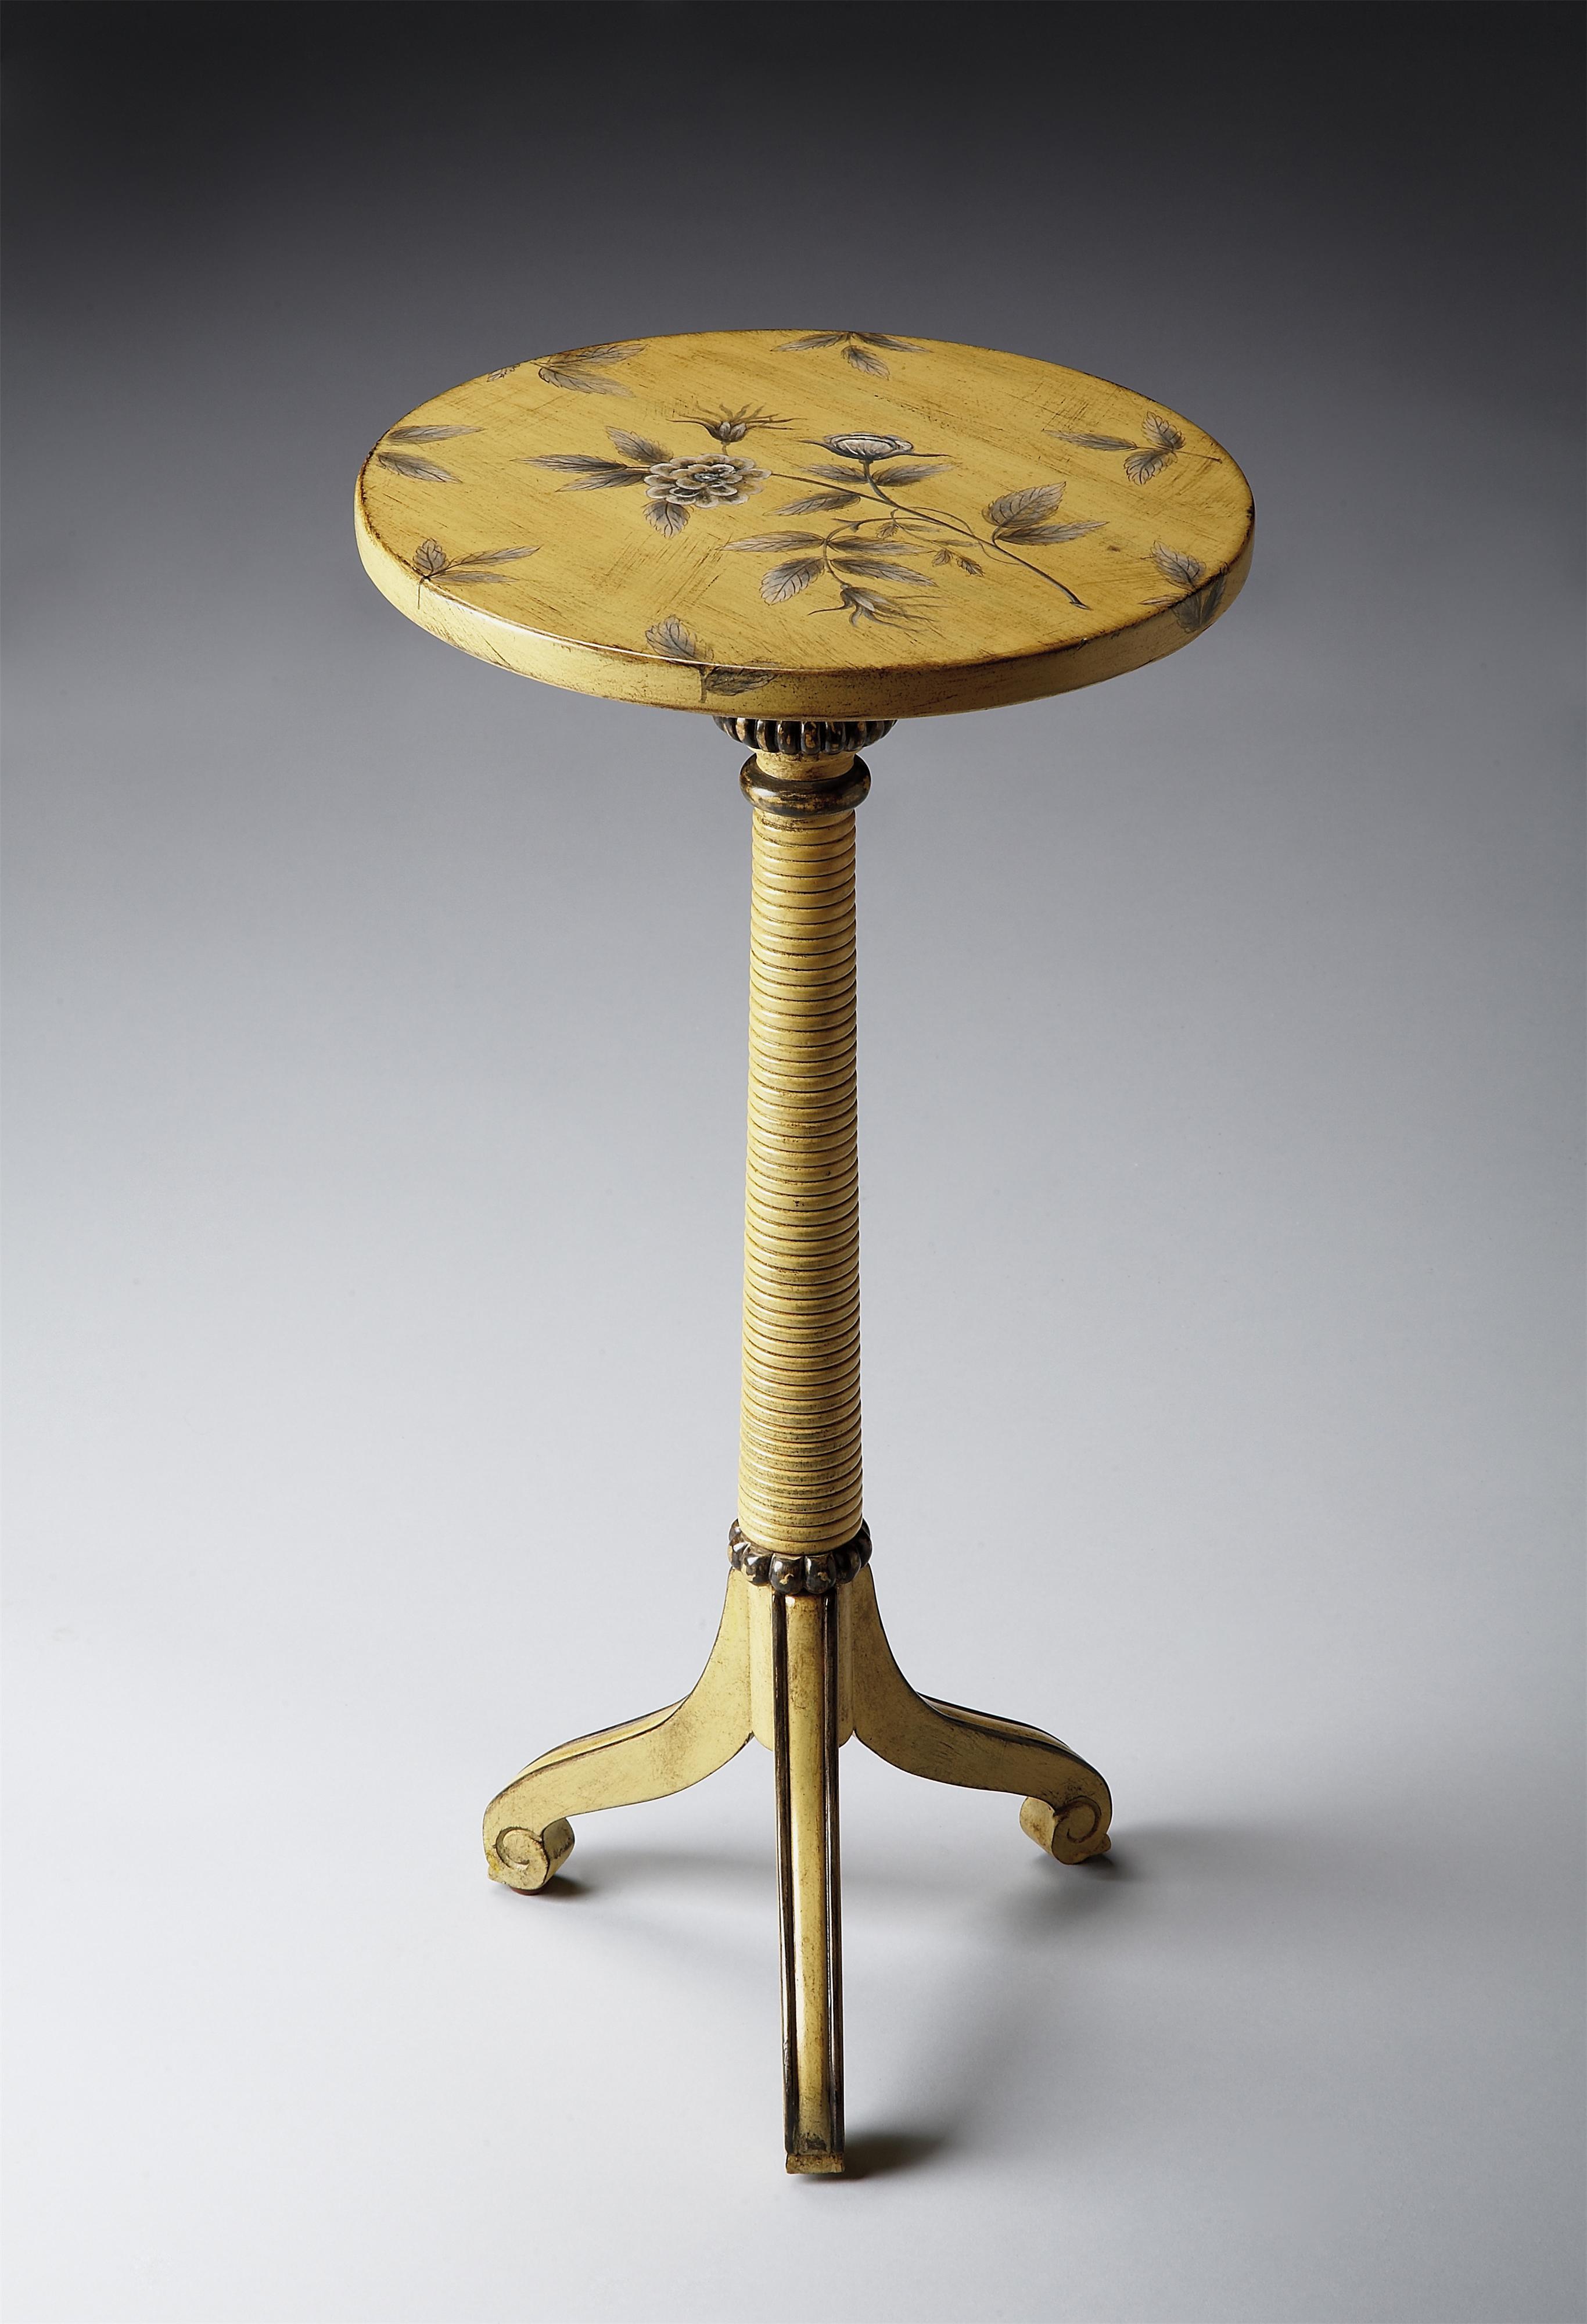 Butler Specialty Company Artist's Originals Pedestal Table - Item Number: 1583196